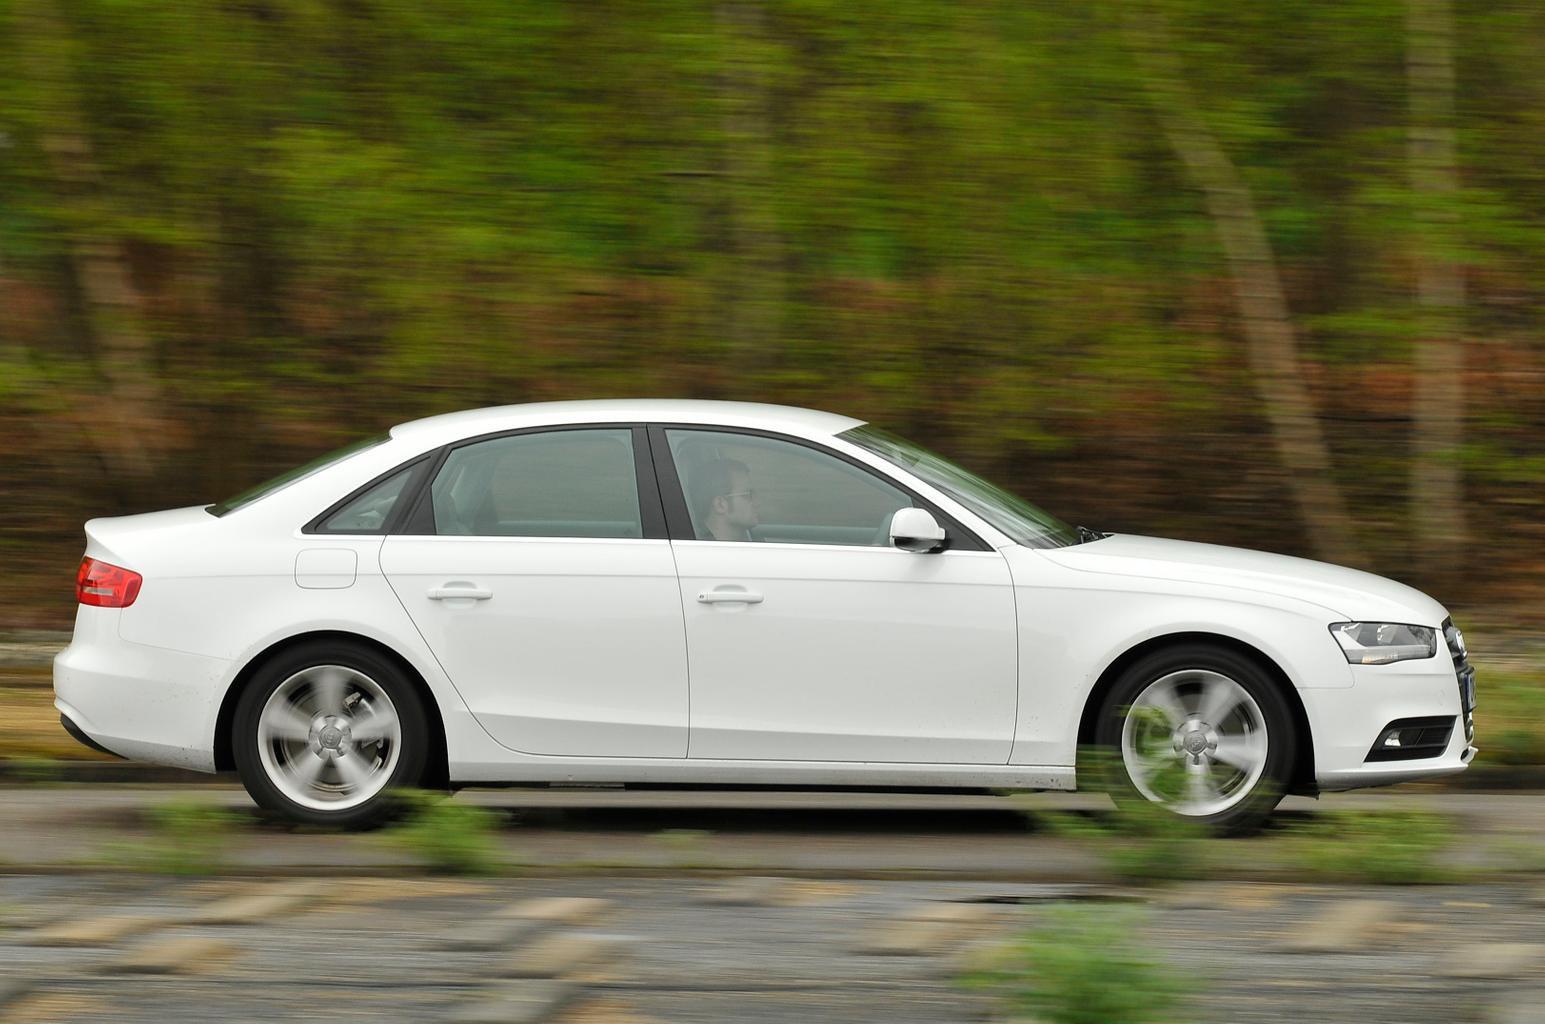 Used test – business class: Audi A4 vs BMW 3 Series vs Citroen DS5 vs Mercedes C-Class